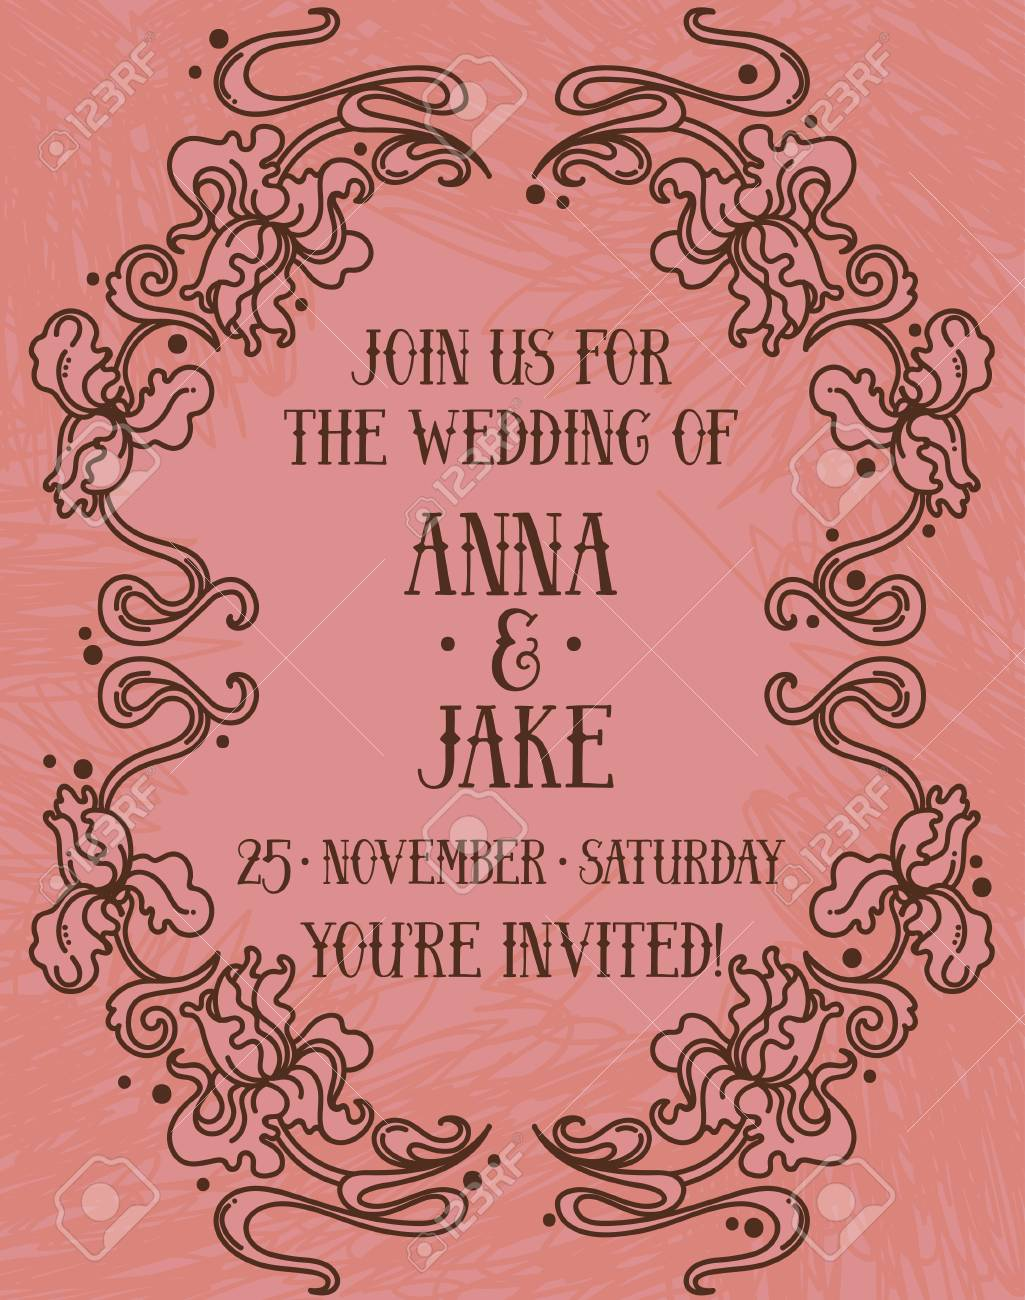 Beautiful Wedding Invitation In Art Nouveau Retro Style, Irises ...